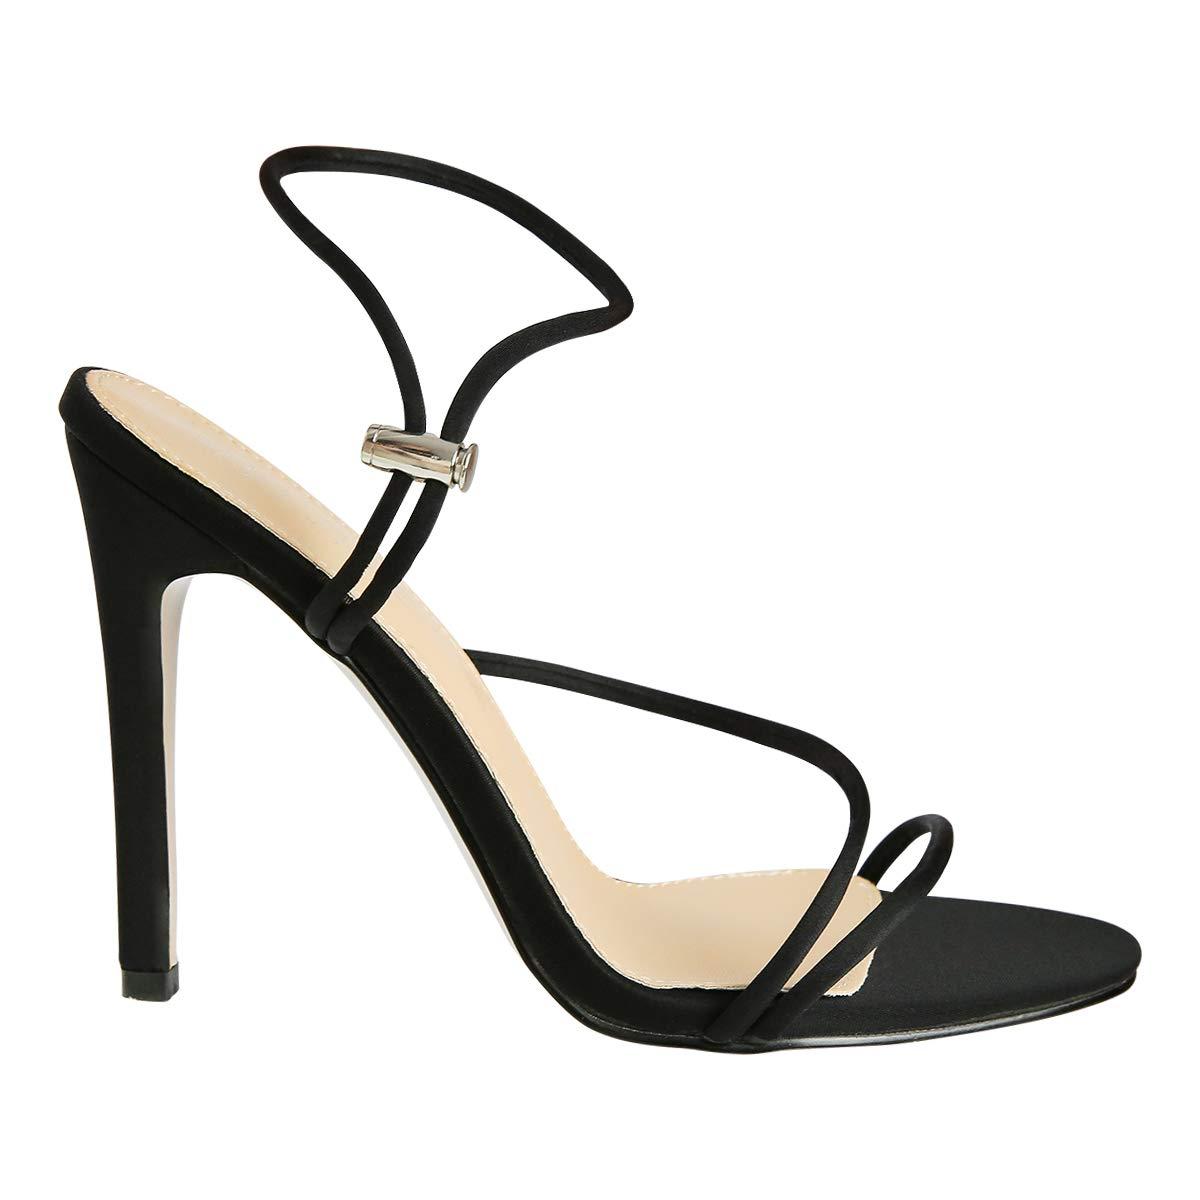 298486d8f12 Amazon.com   OLCHEE Women's Fashion Strappy High Heel Sandals ...